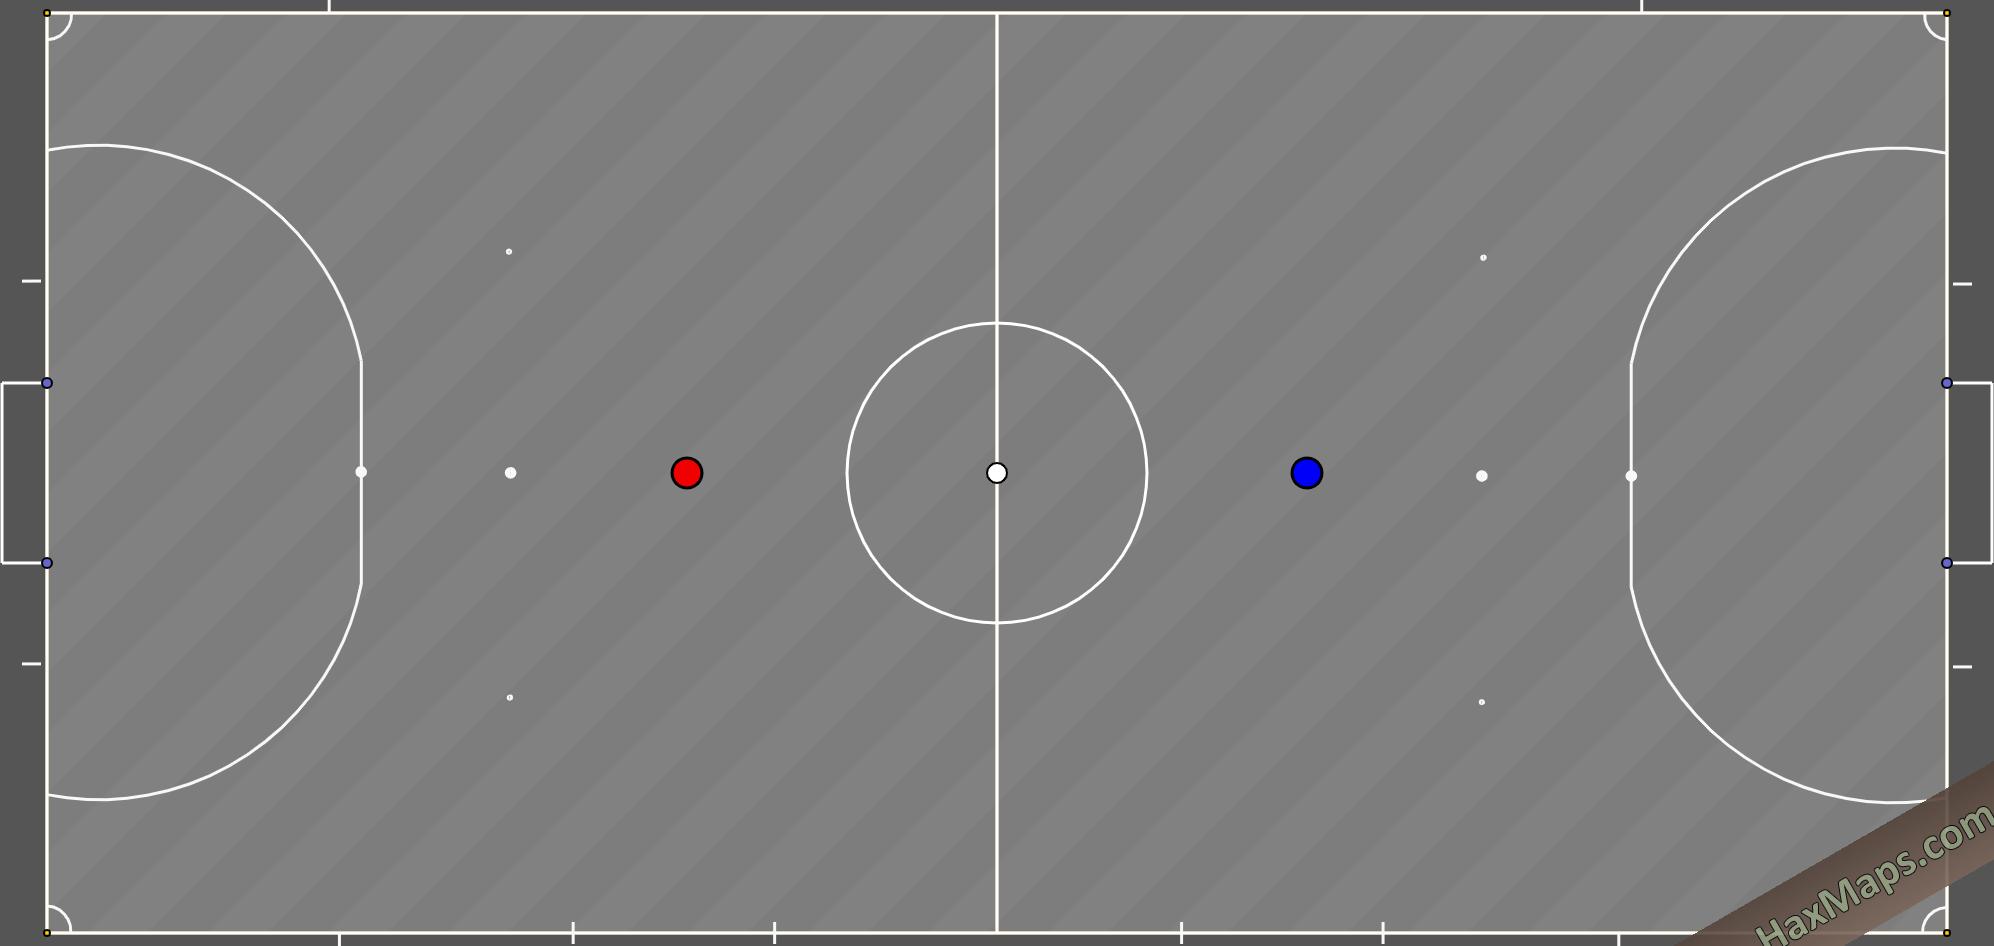 hax ball maps | Futsal x5 GLH ; By Bazinga!